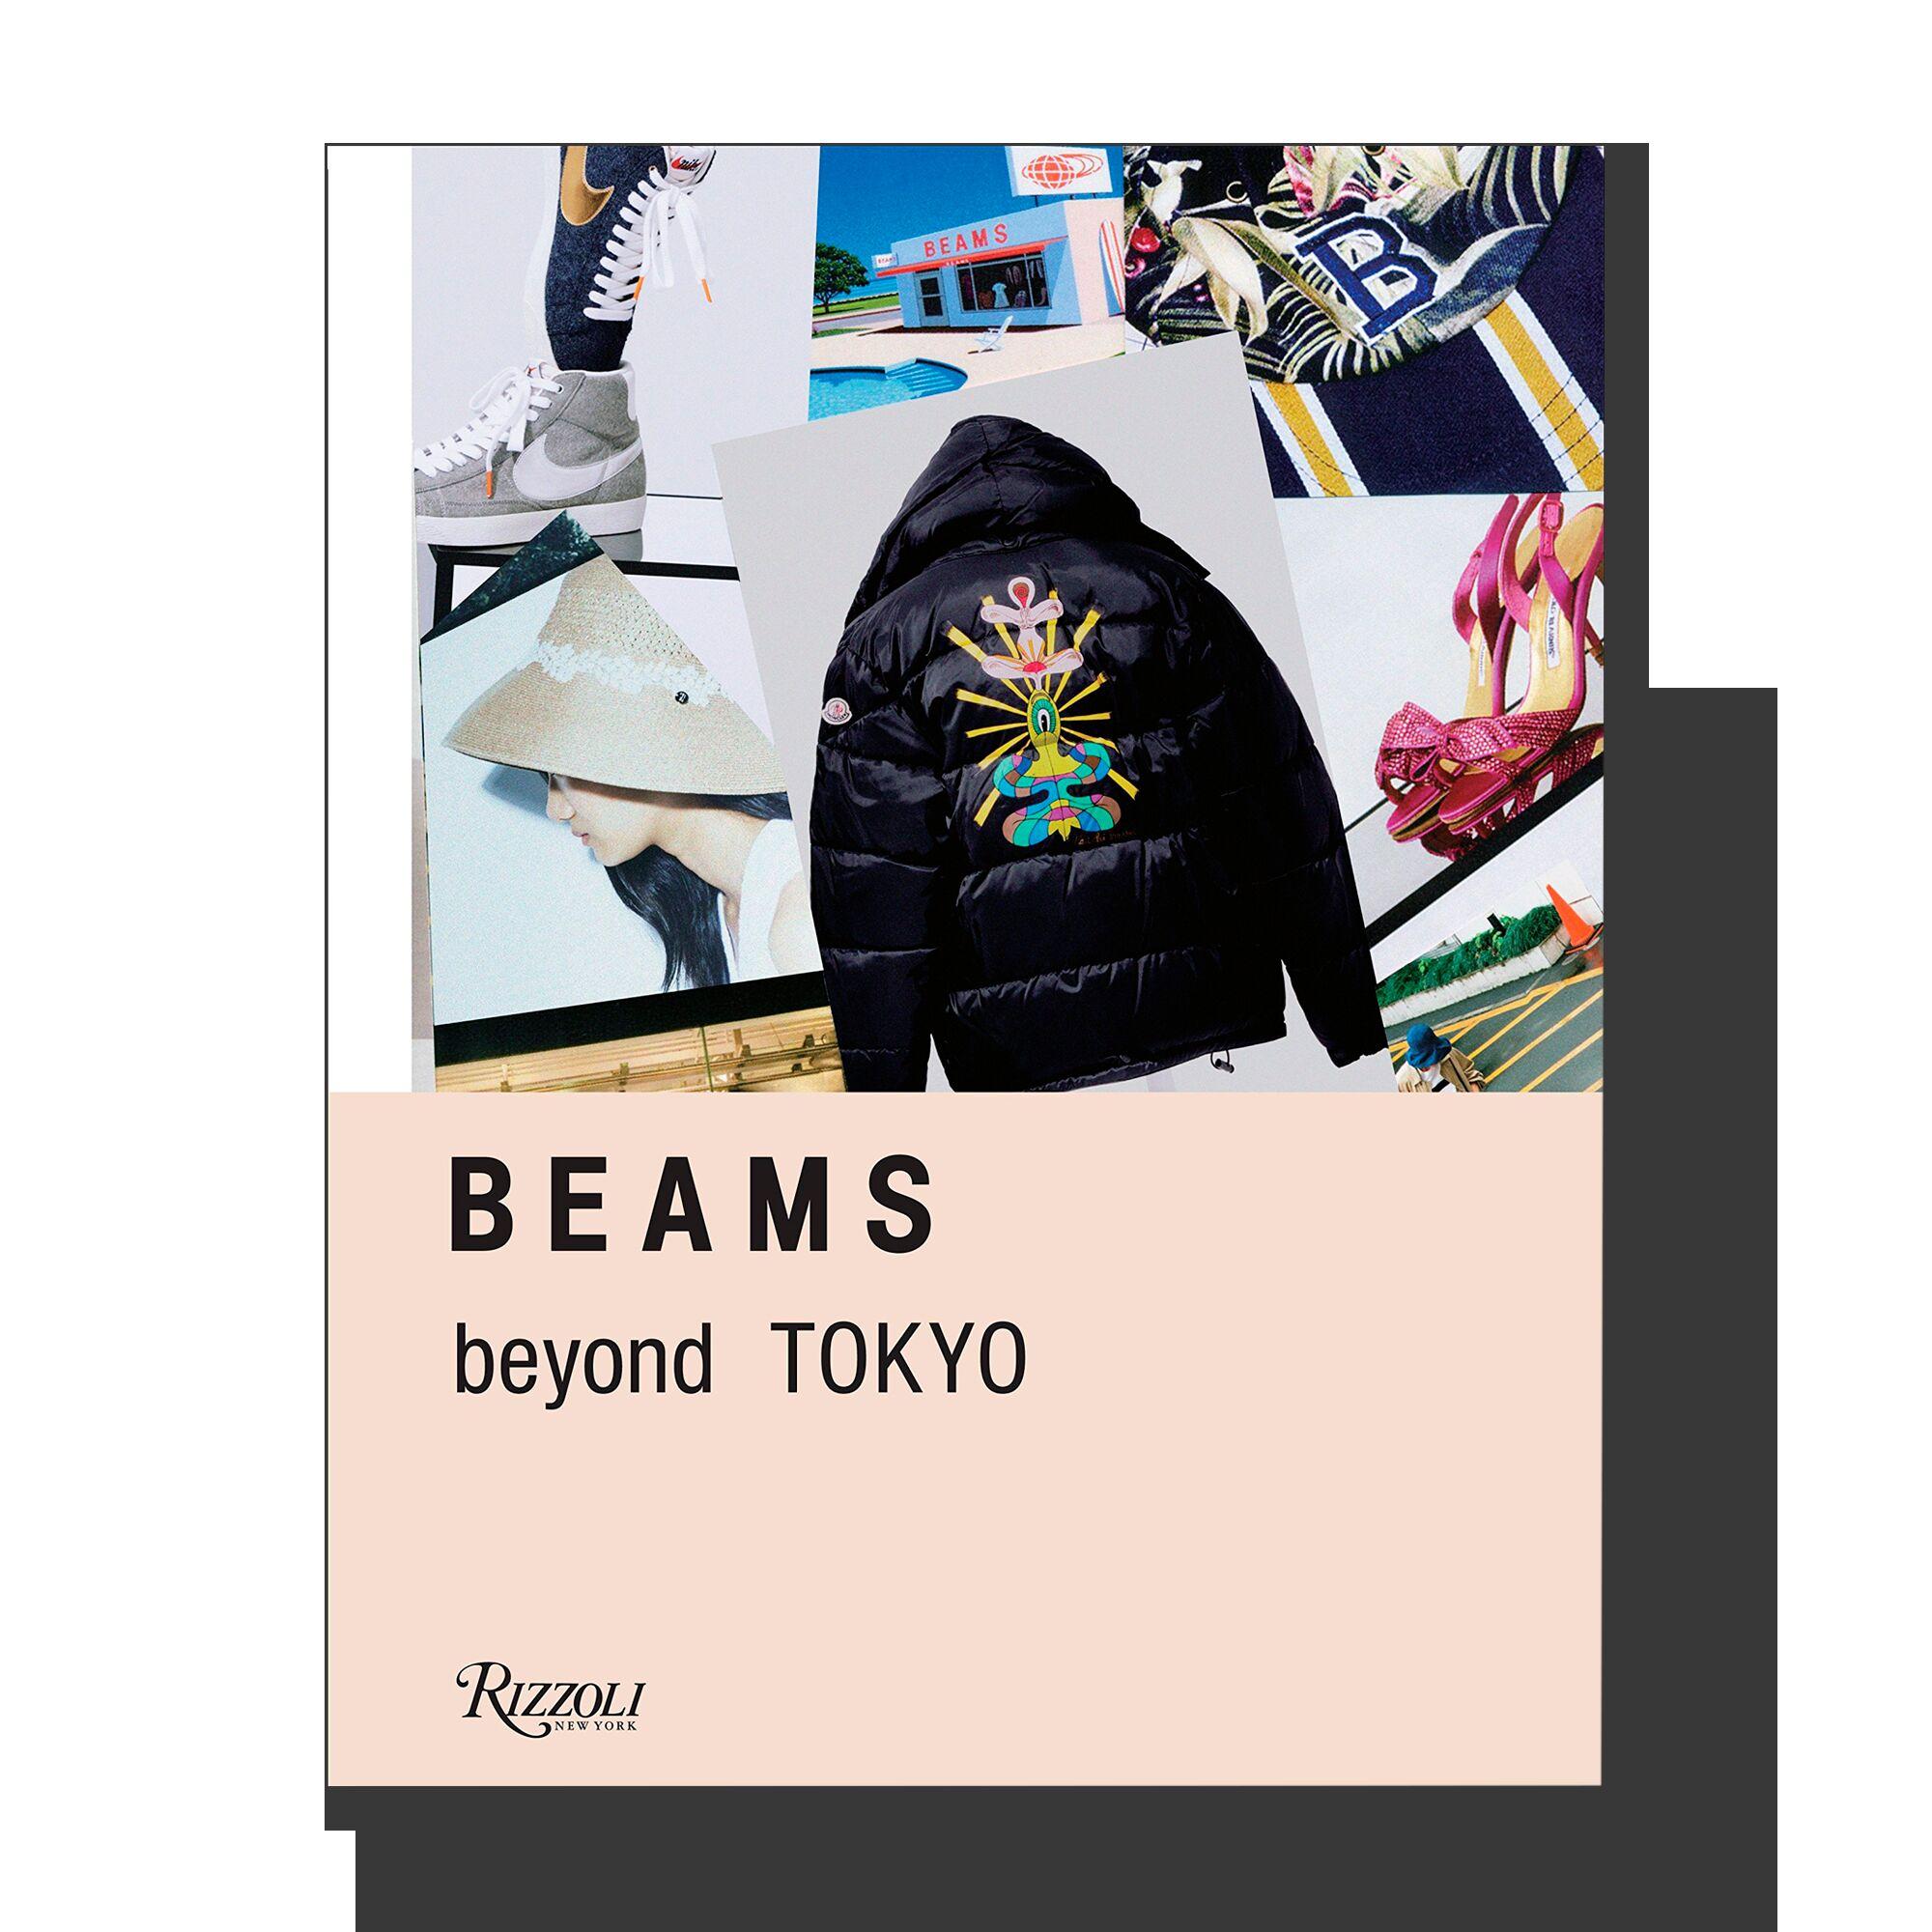 Beams: Beyond Tokyo - Innovative Fashion and Streetwear